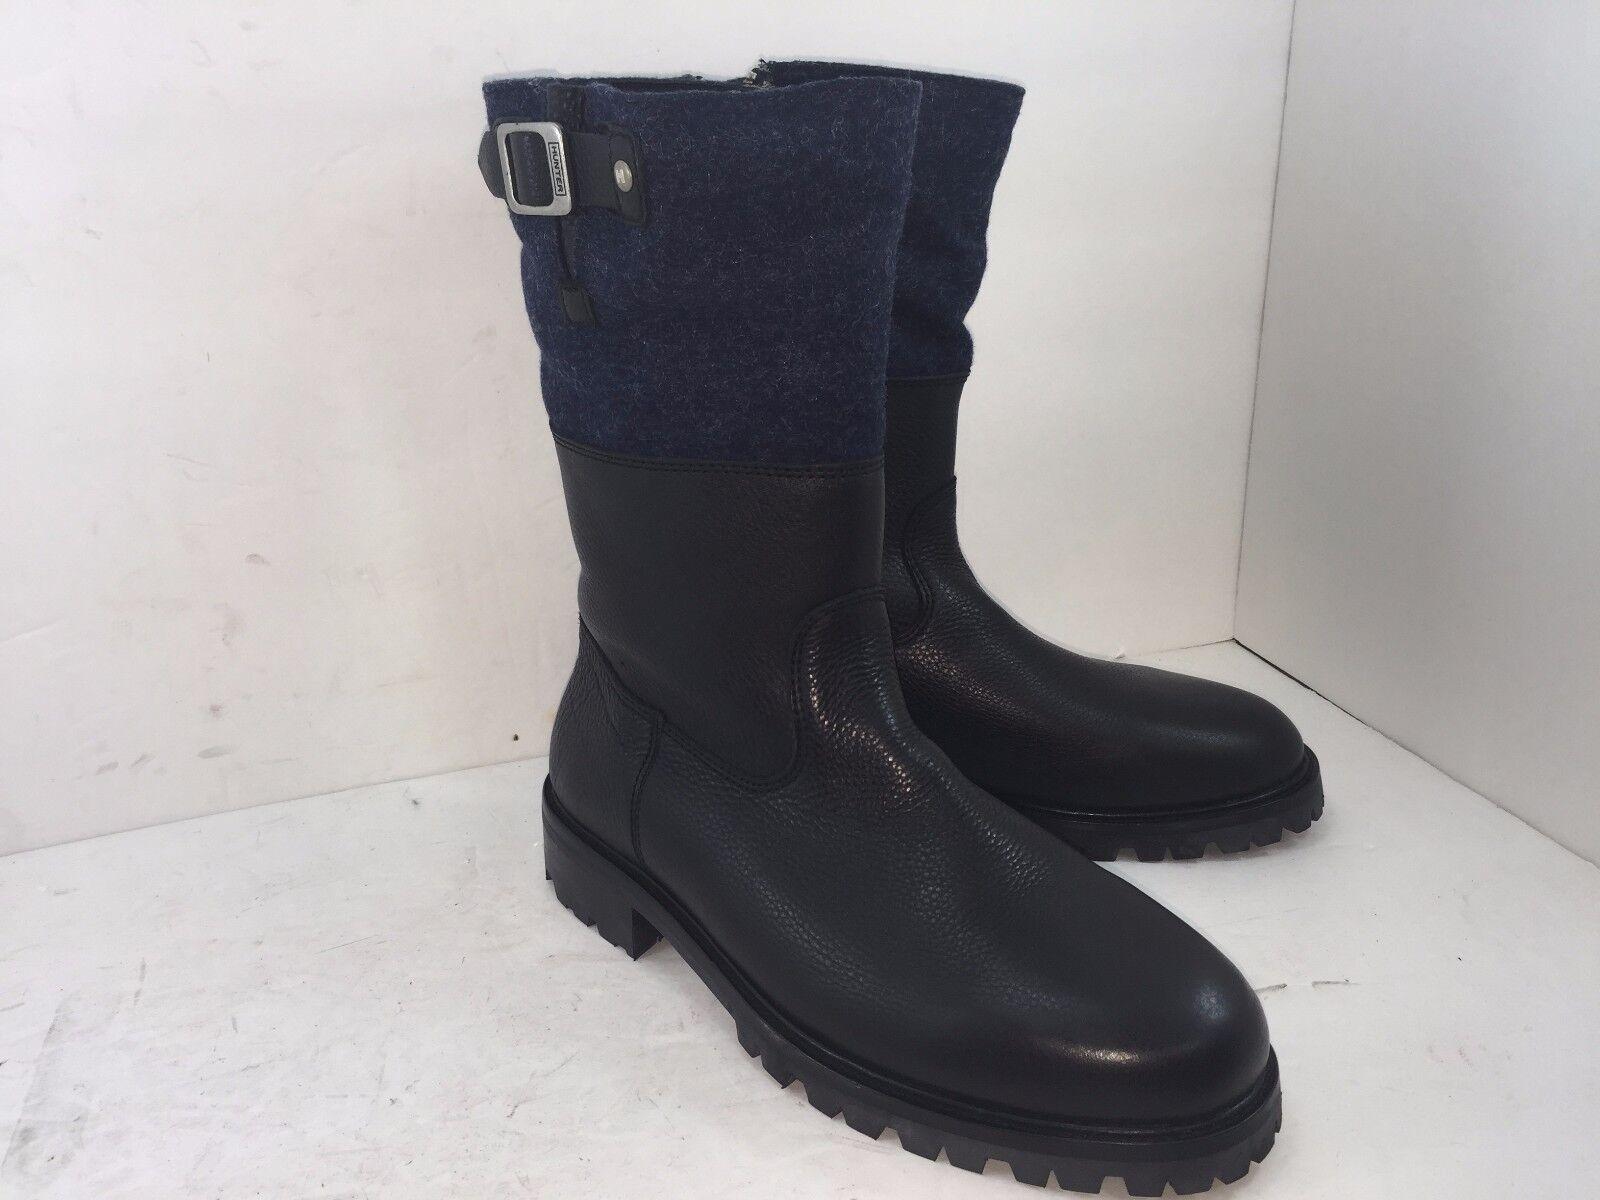 Baffin Mens Hunter-M Green Rainboots Size 9 (272893)